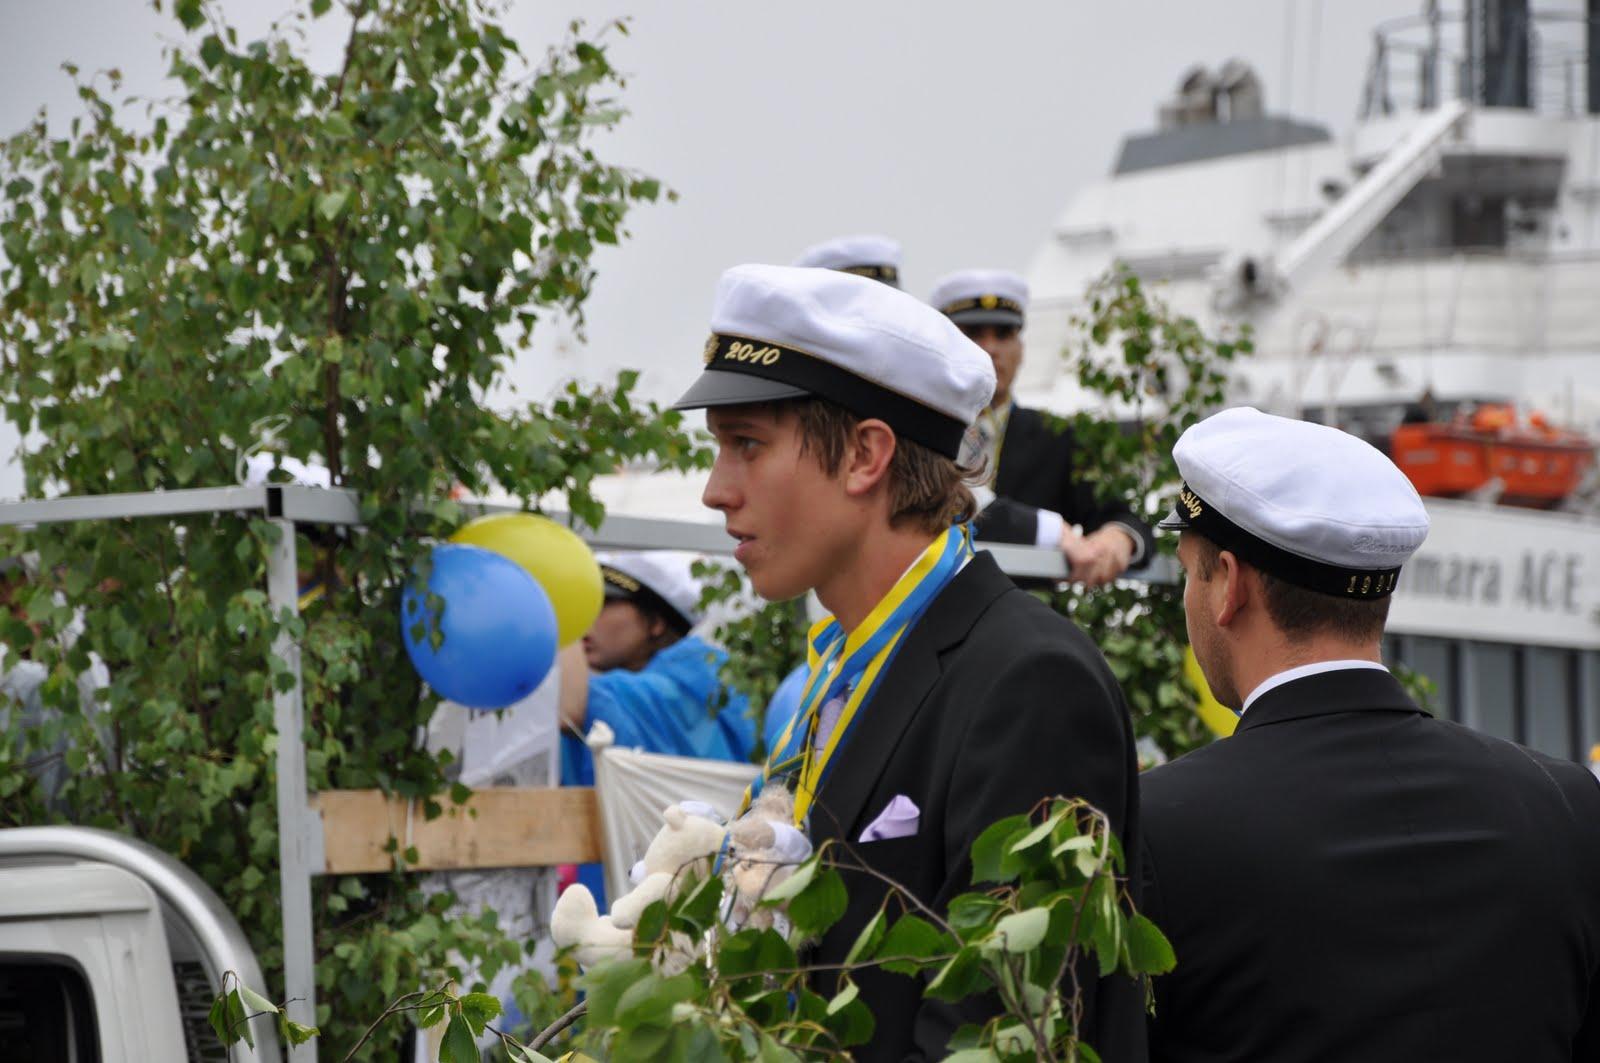 Svealand Karta Sex Tjejer Helsingborg